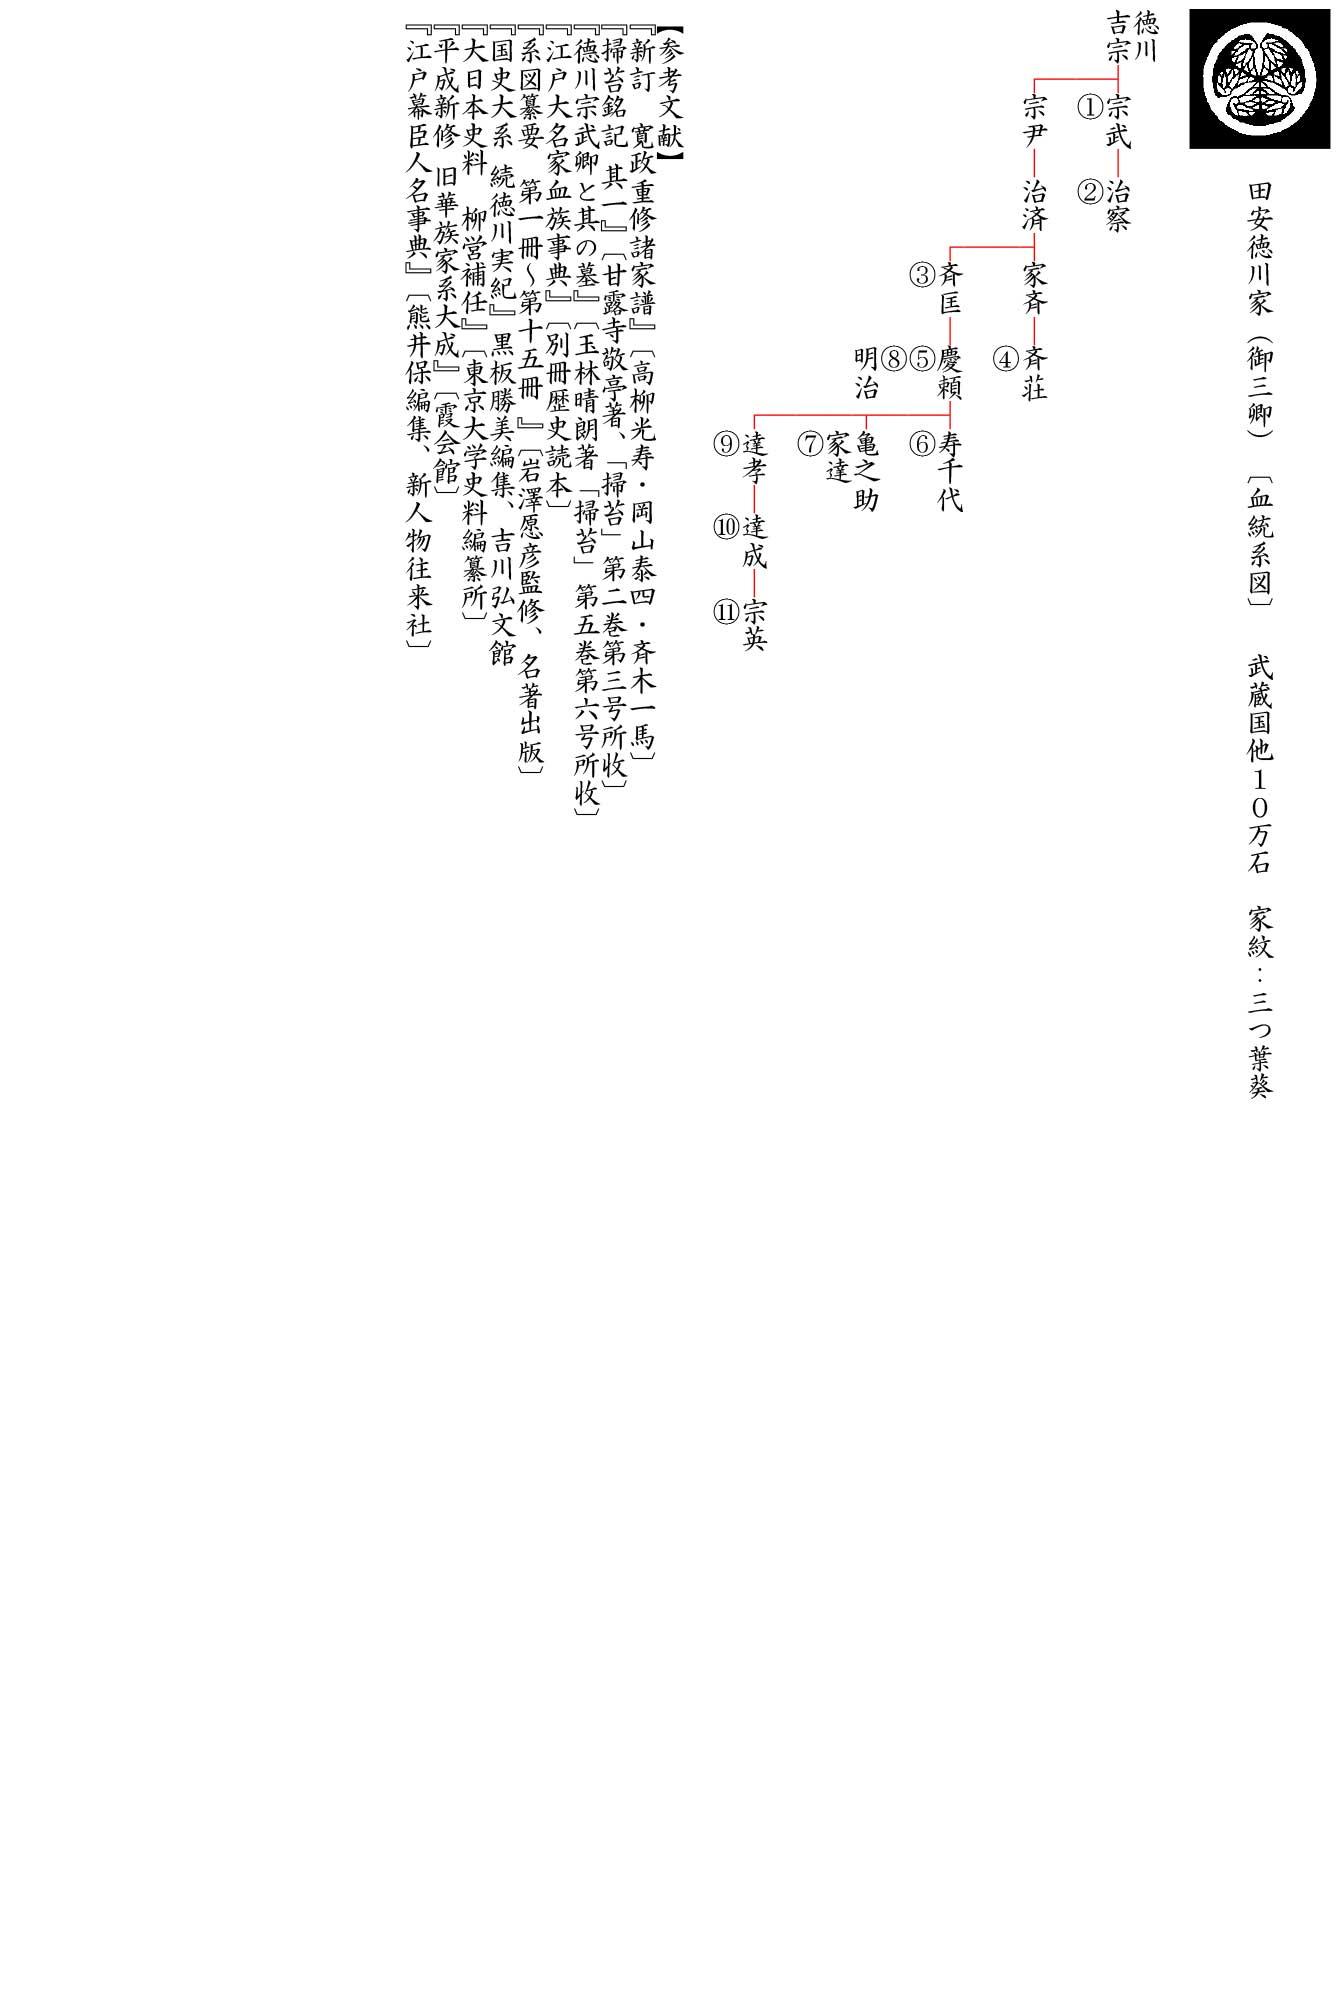 三 卿 御 徳川